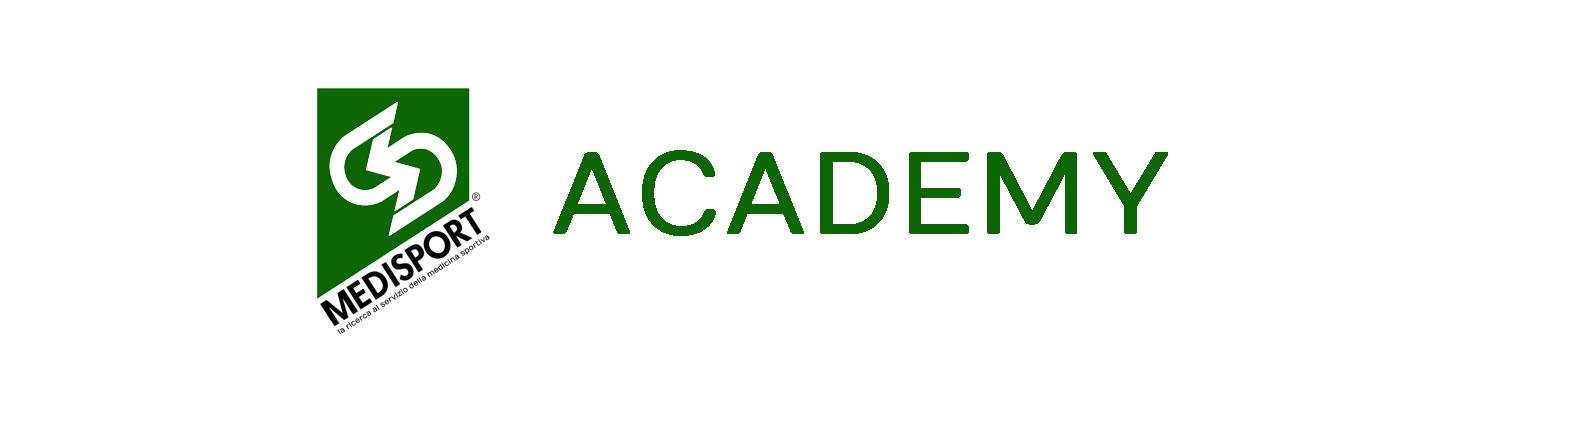 Medisport Academy